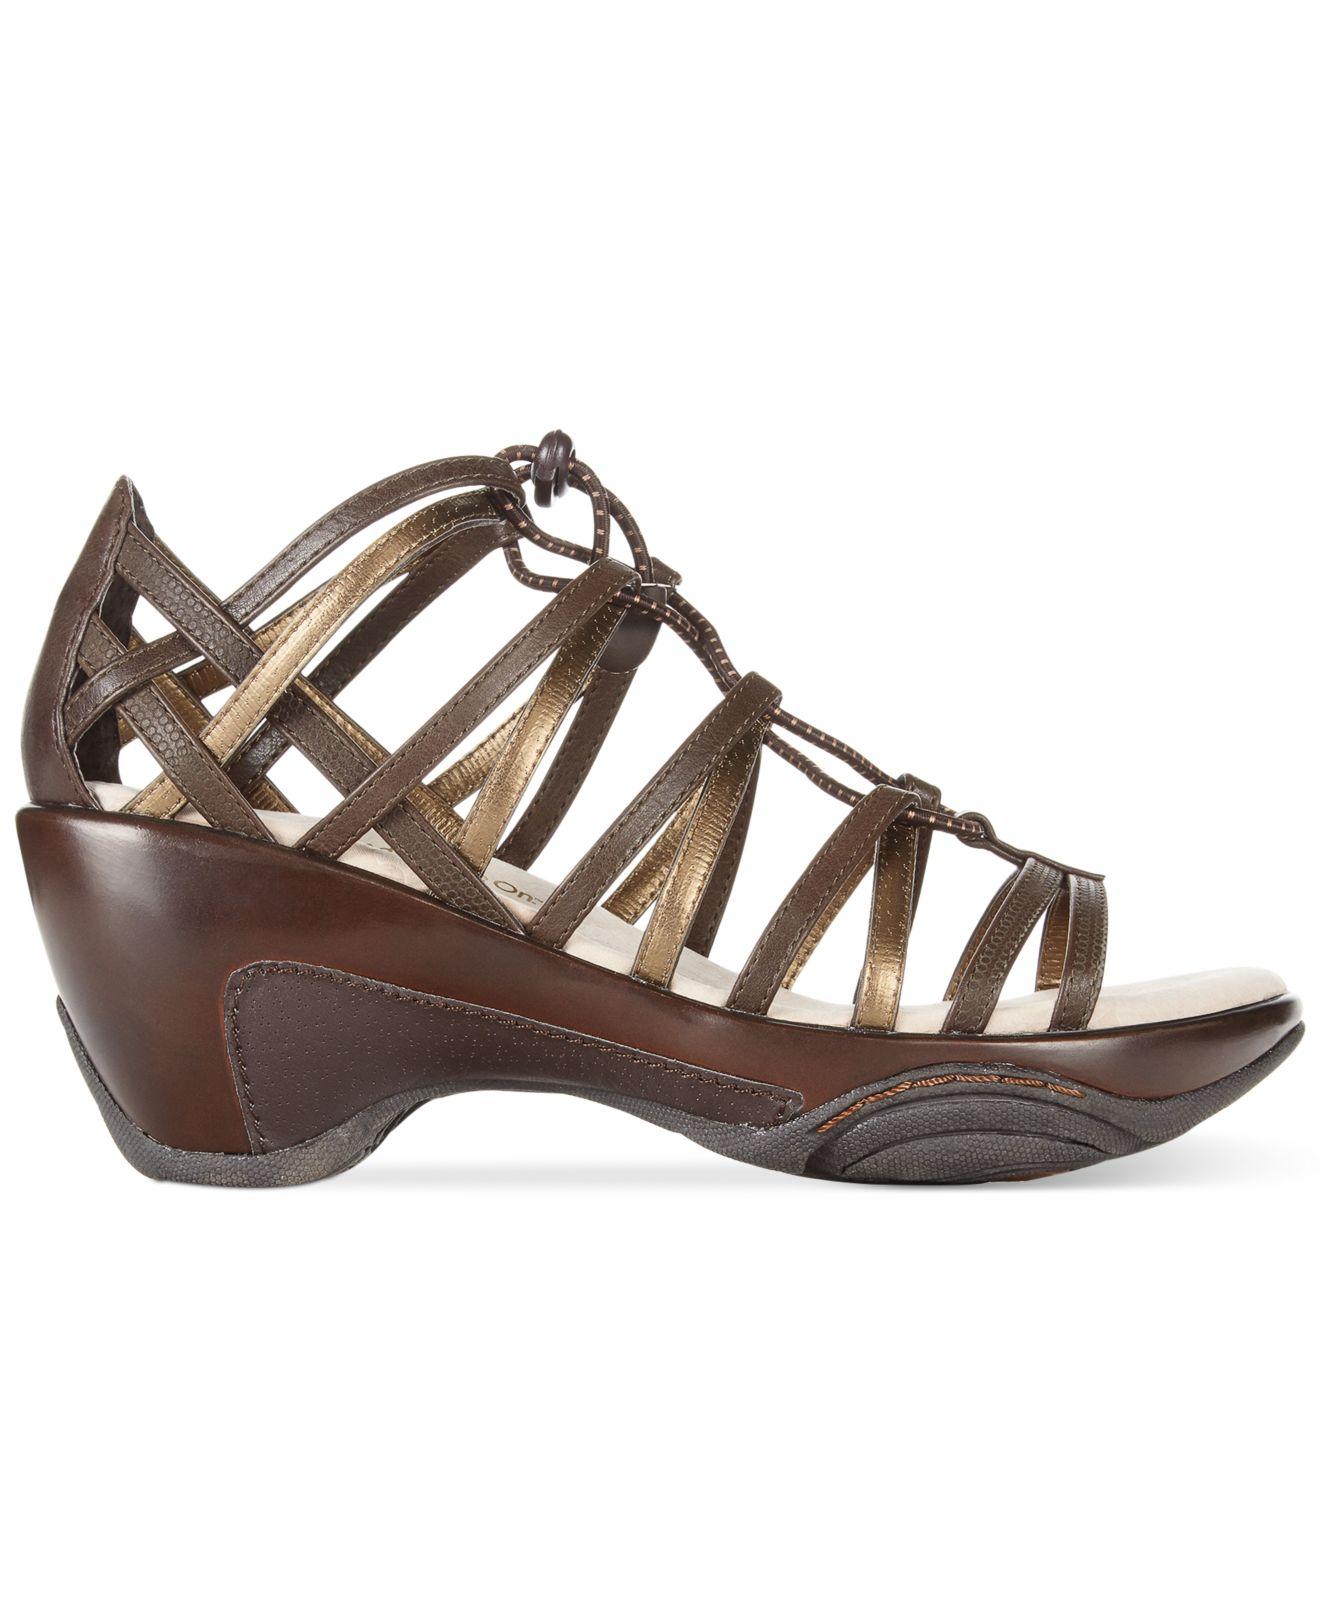 e4cdc1deb83 Lyst - Jambu Jbu Women S Aphrodite Wedge Sandals in Brown